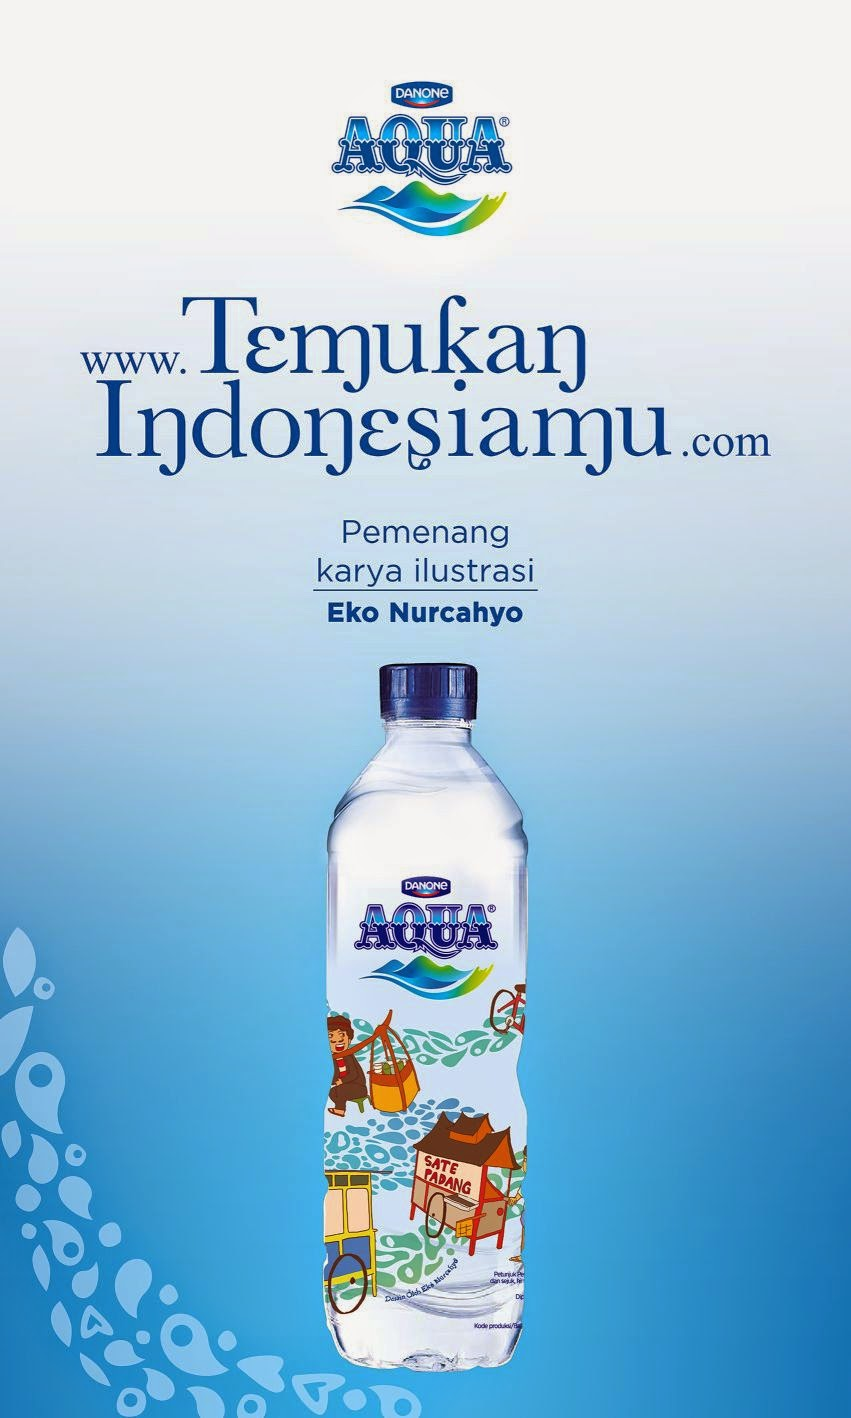 Inovasi dan Kewirausahaan Minuman AQUA